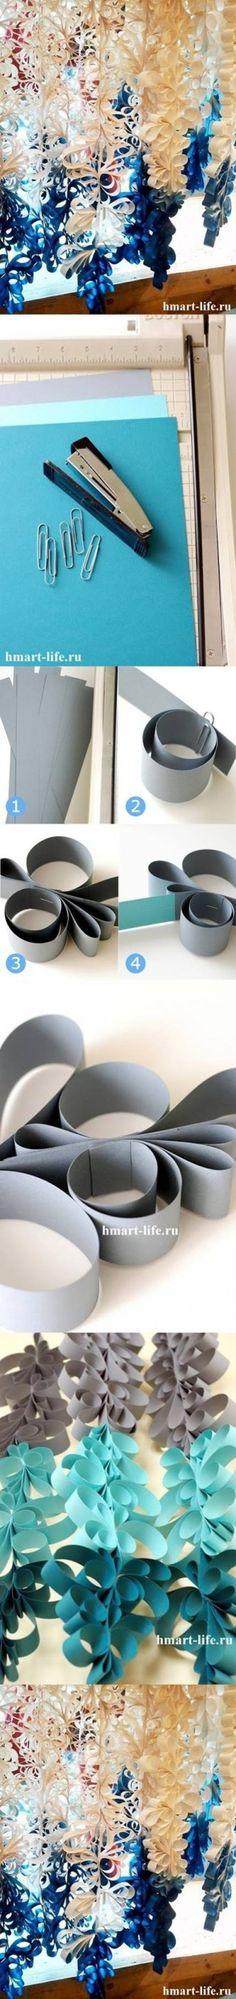 DIY How To Make Garlands